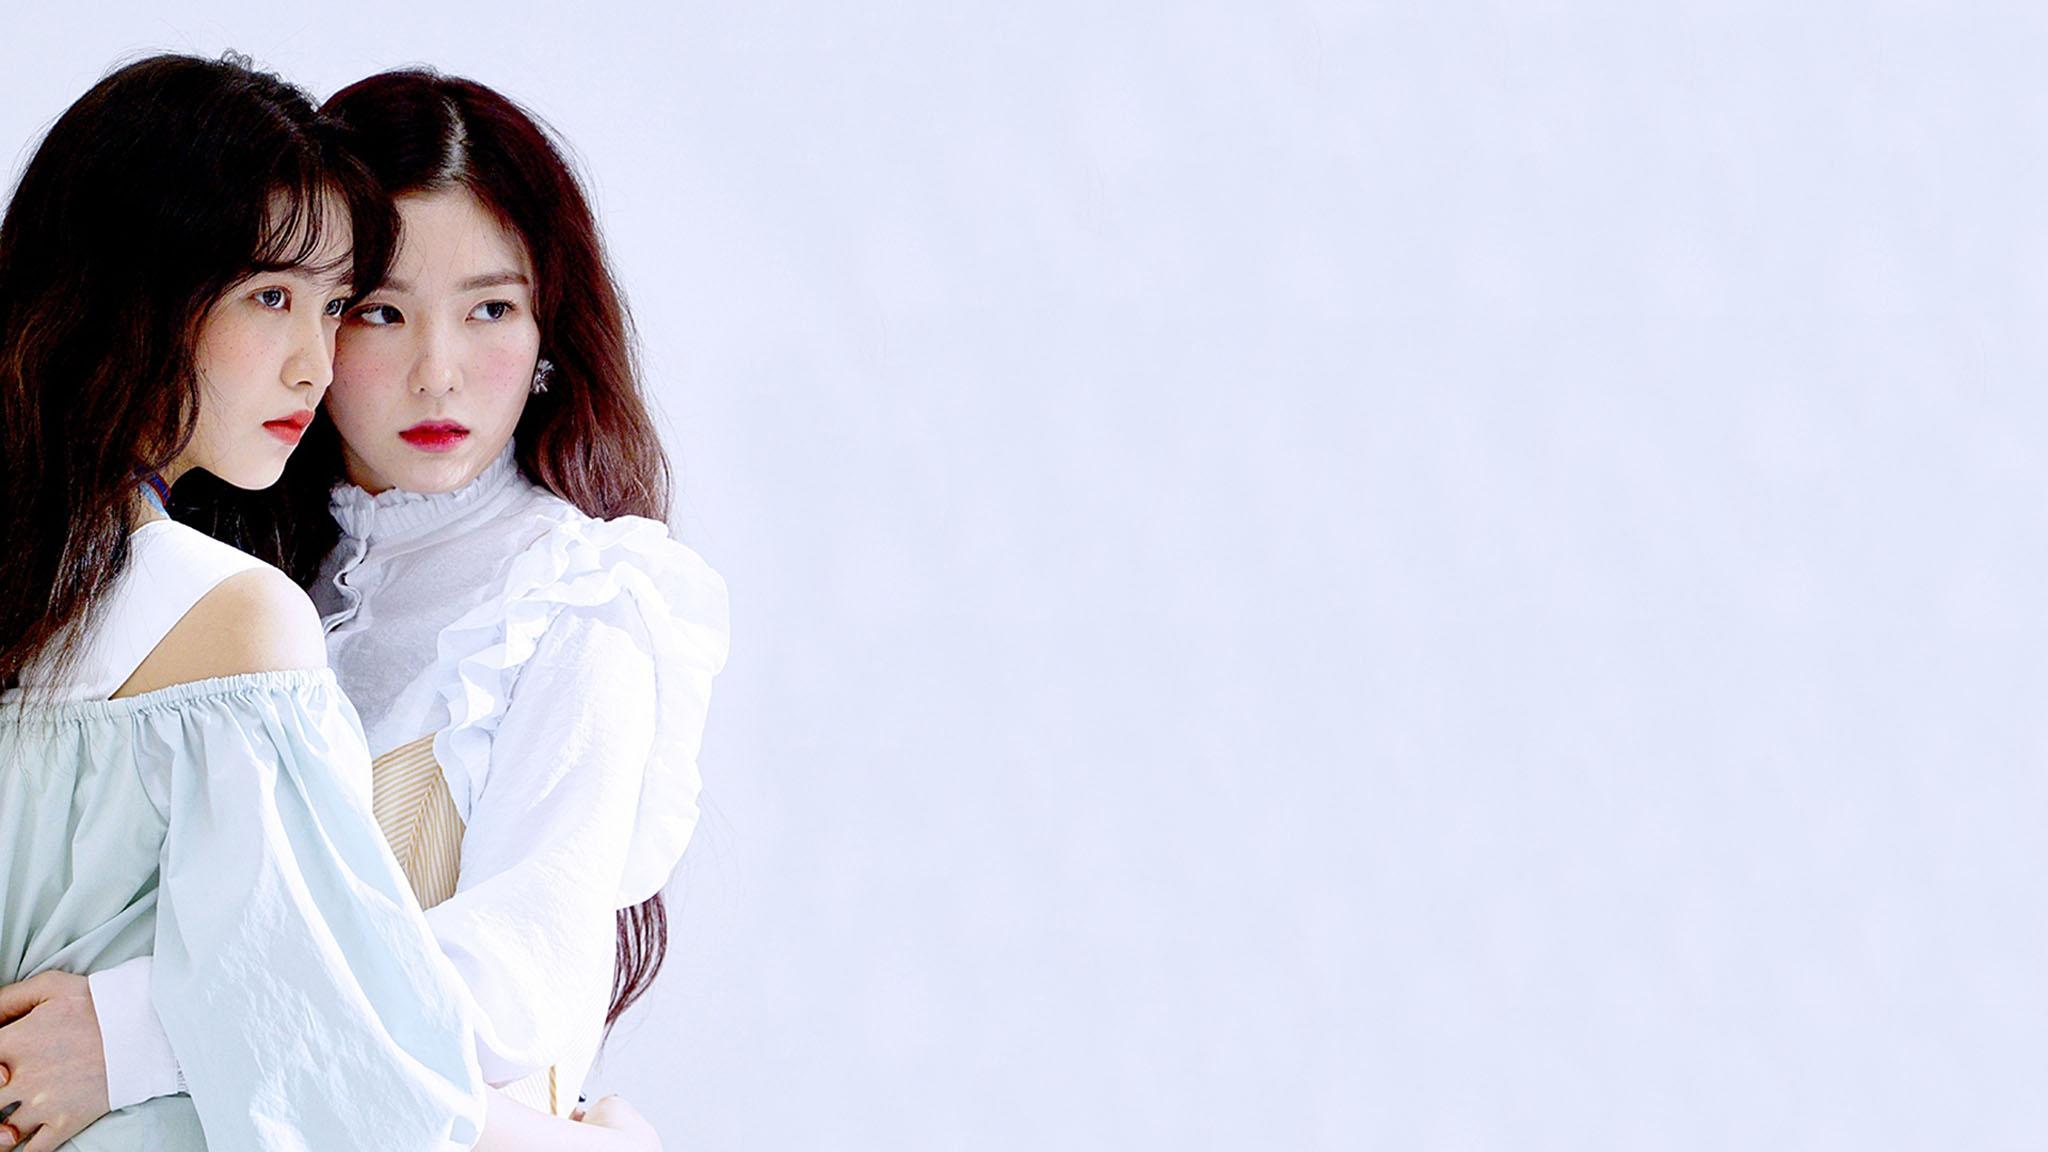 Red Velvet Images Yeri Irene Hd Fond D Ecran And Background Photos